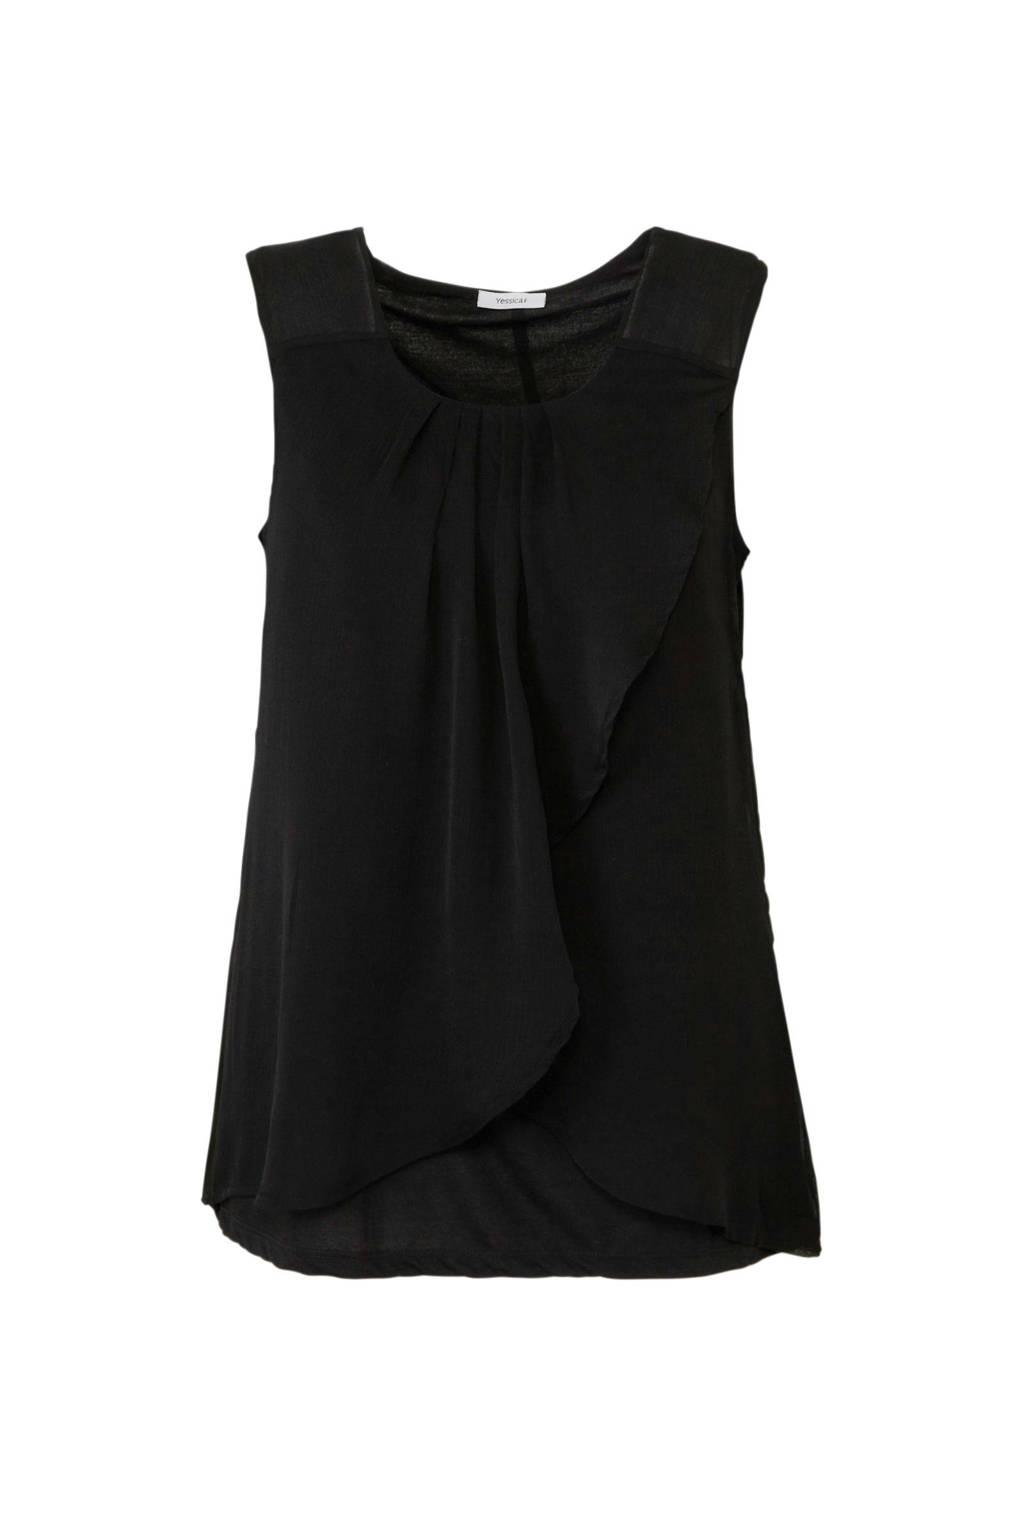 C&A XL Yessica semi-transparante top met overslag, Zwart